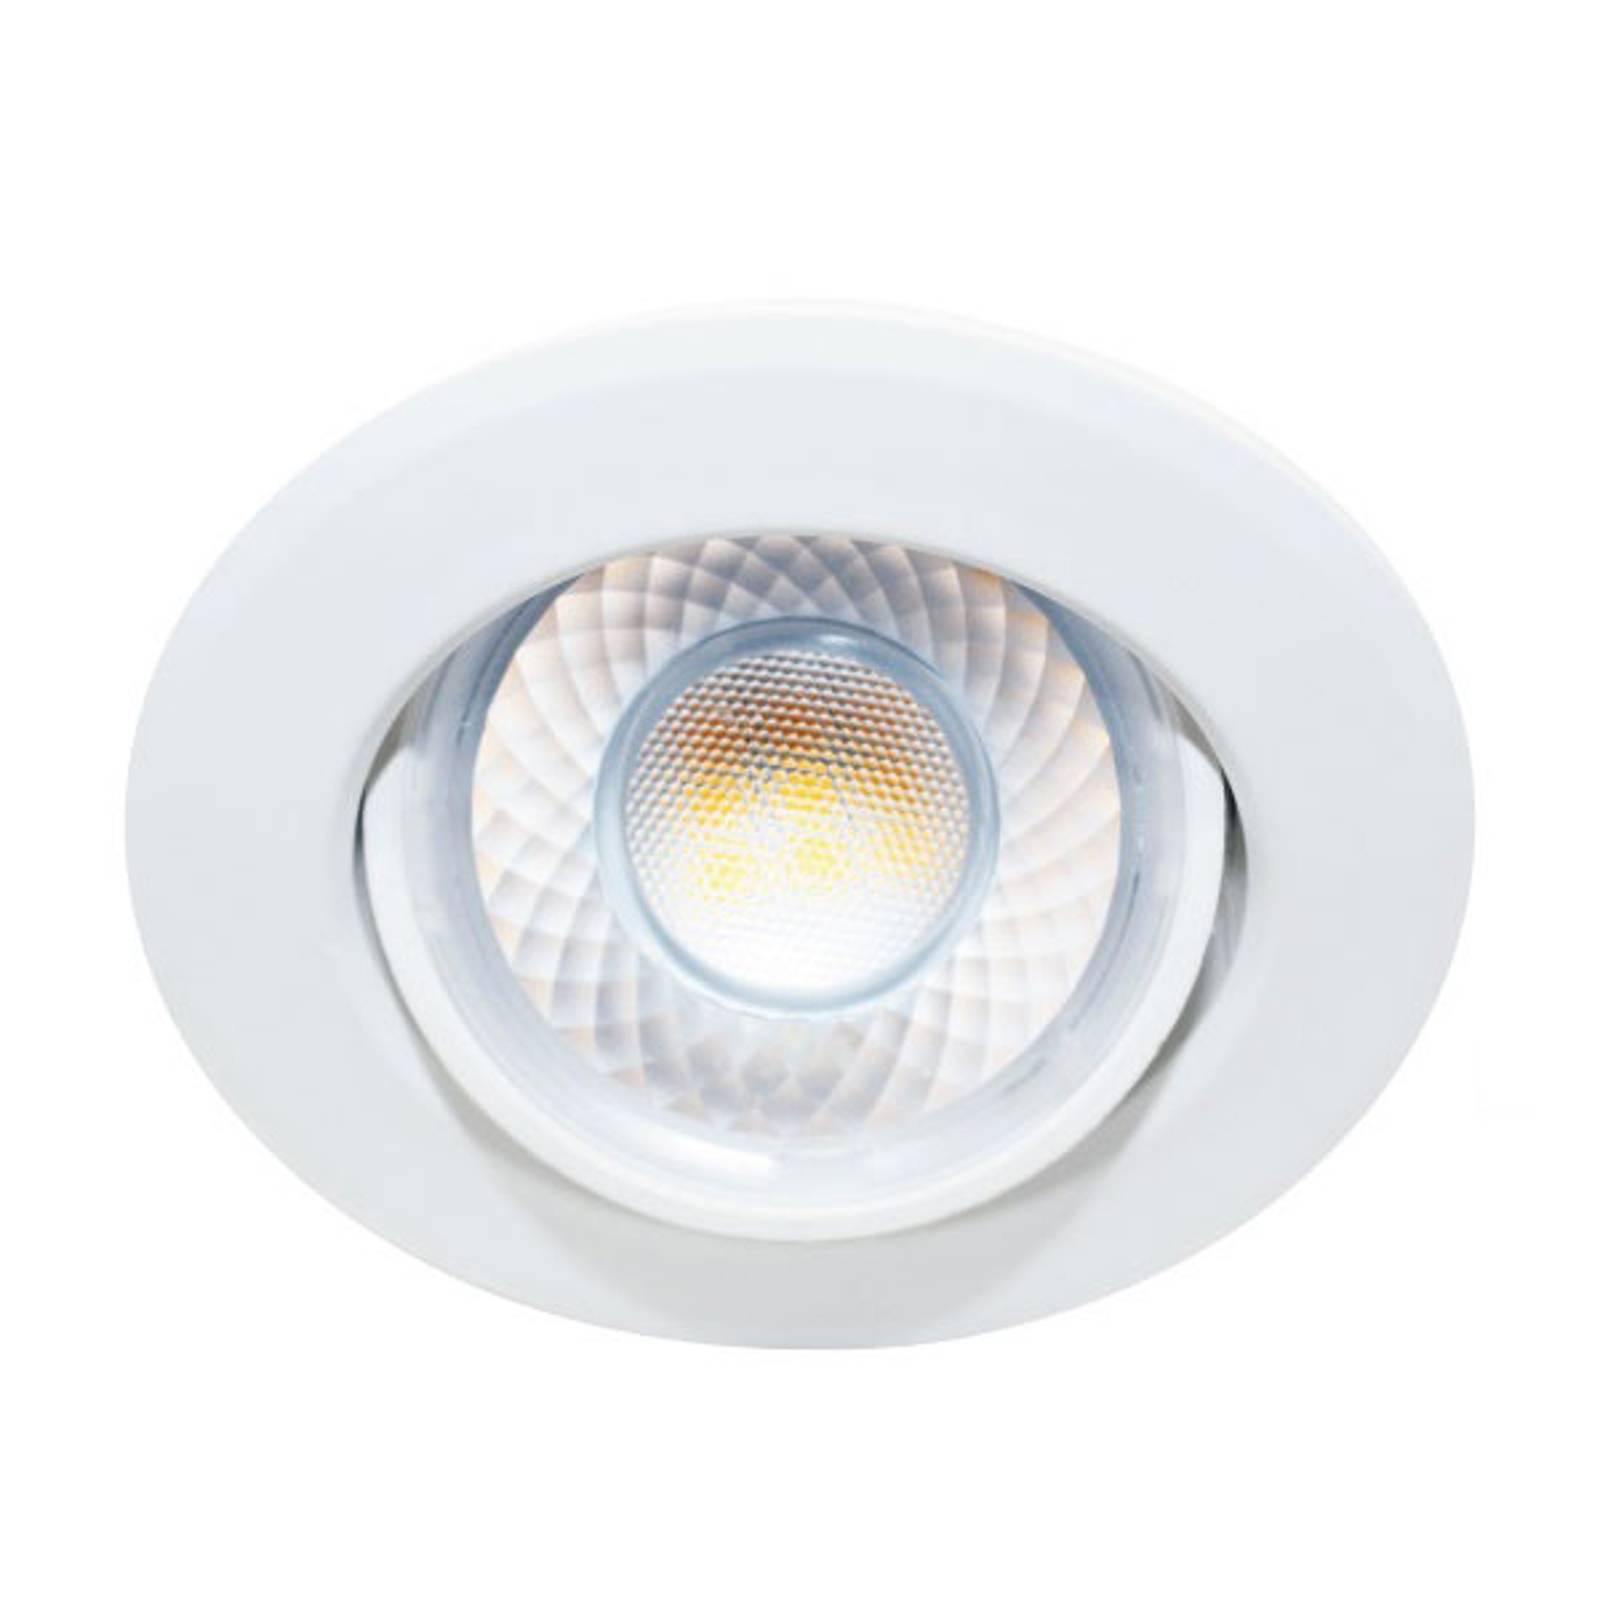 LED-Einbaustrahler Dekto 7,8cm 38° 8W Ra90 5.000K günstig online kaufen